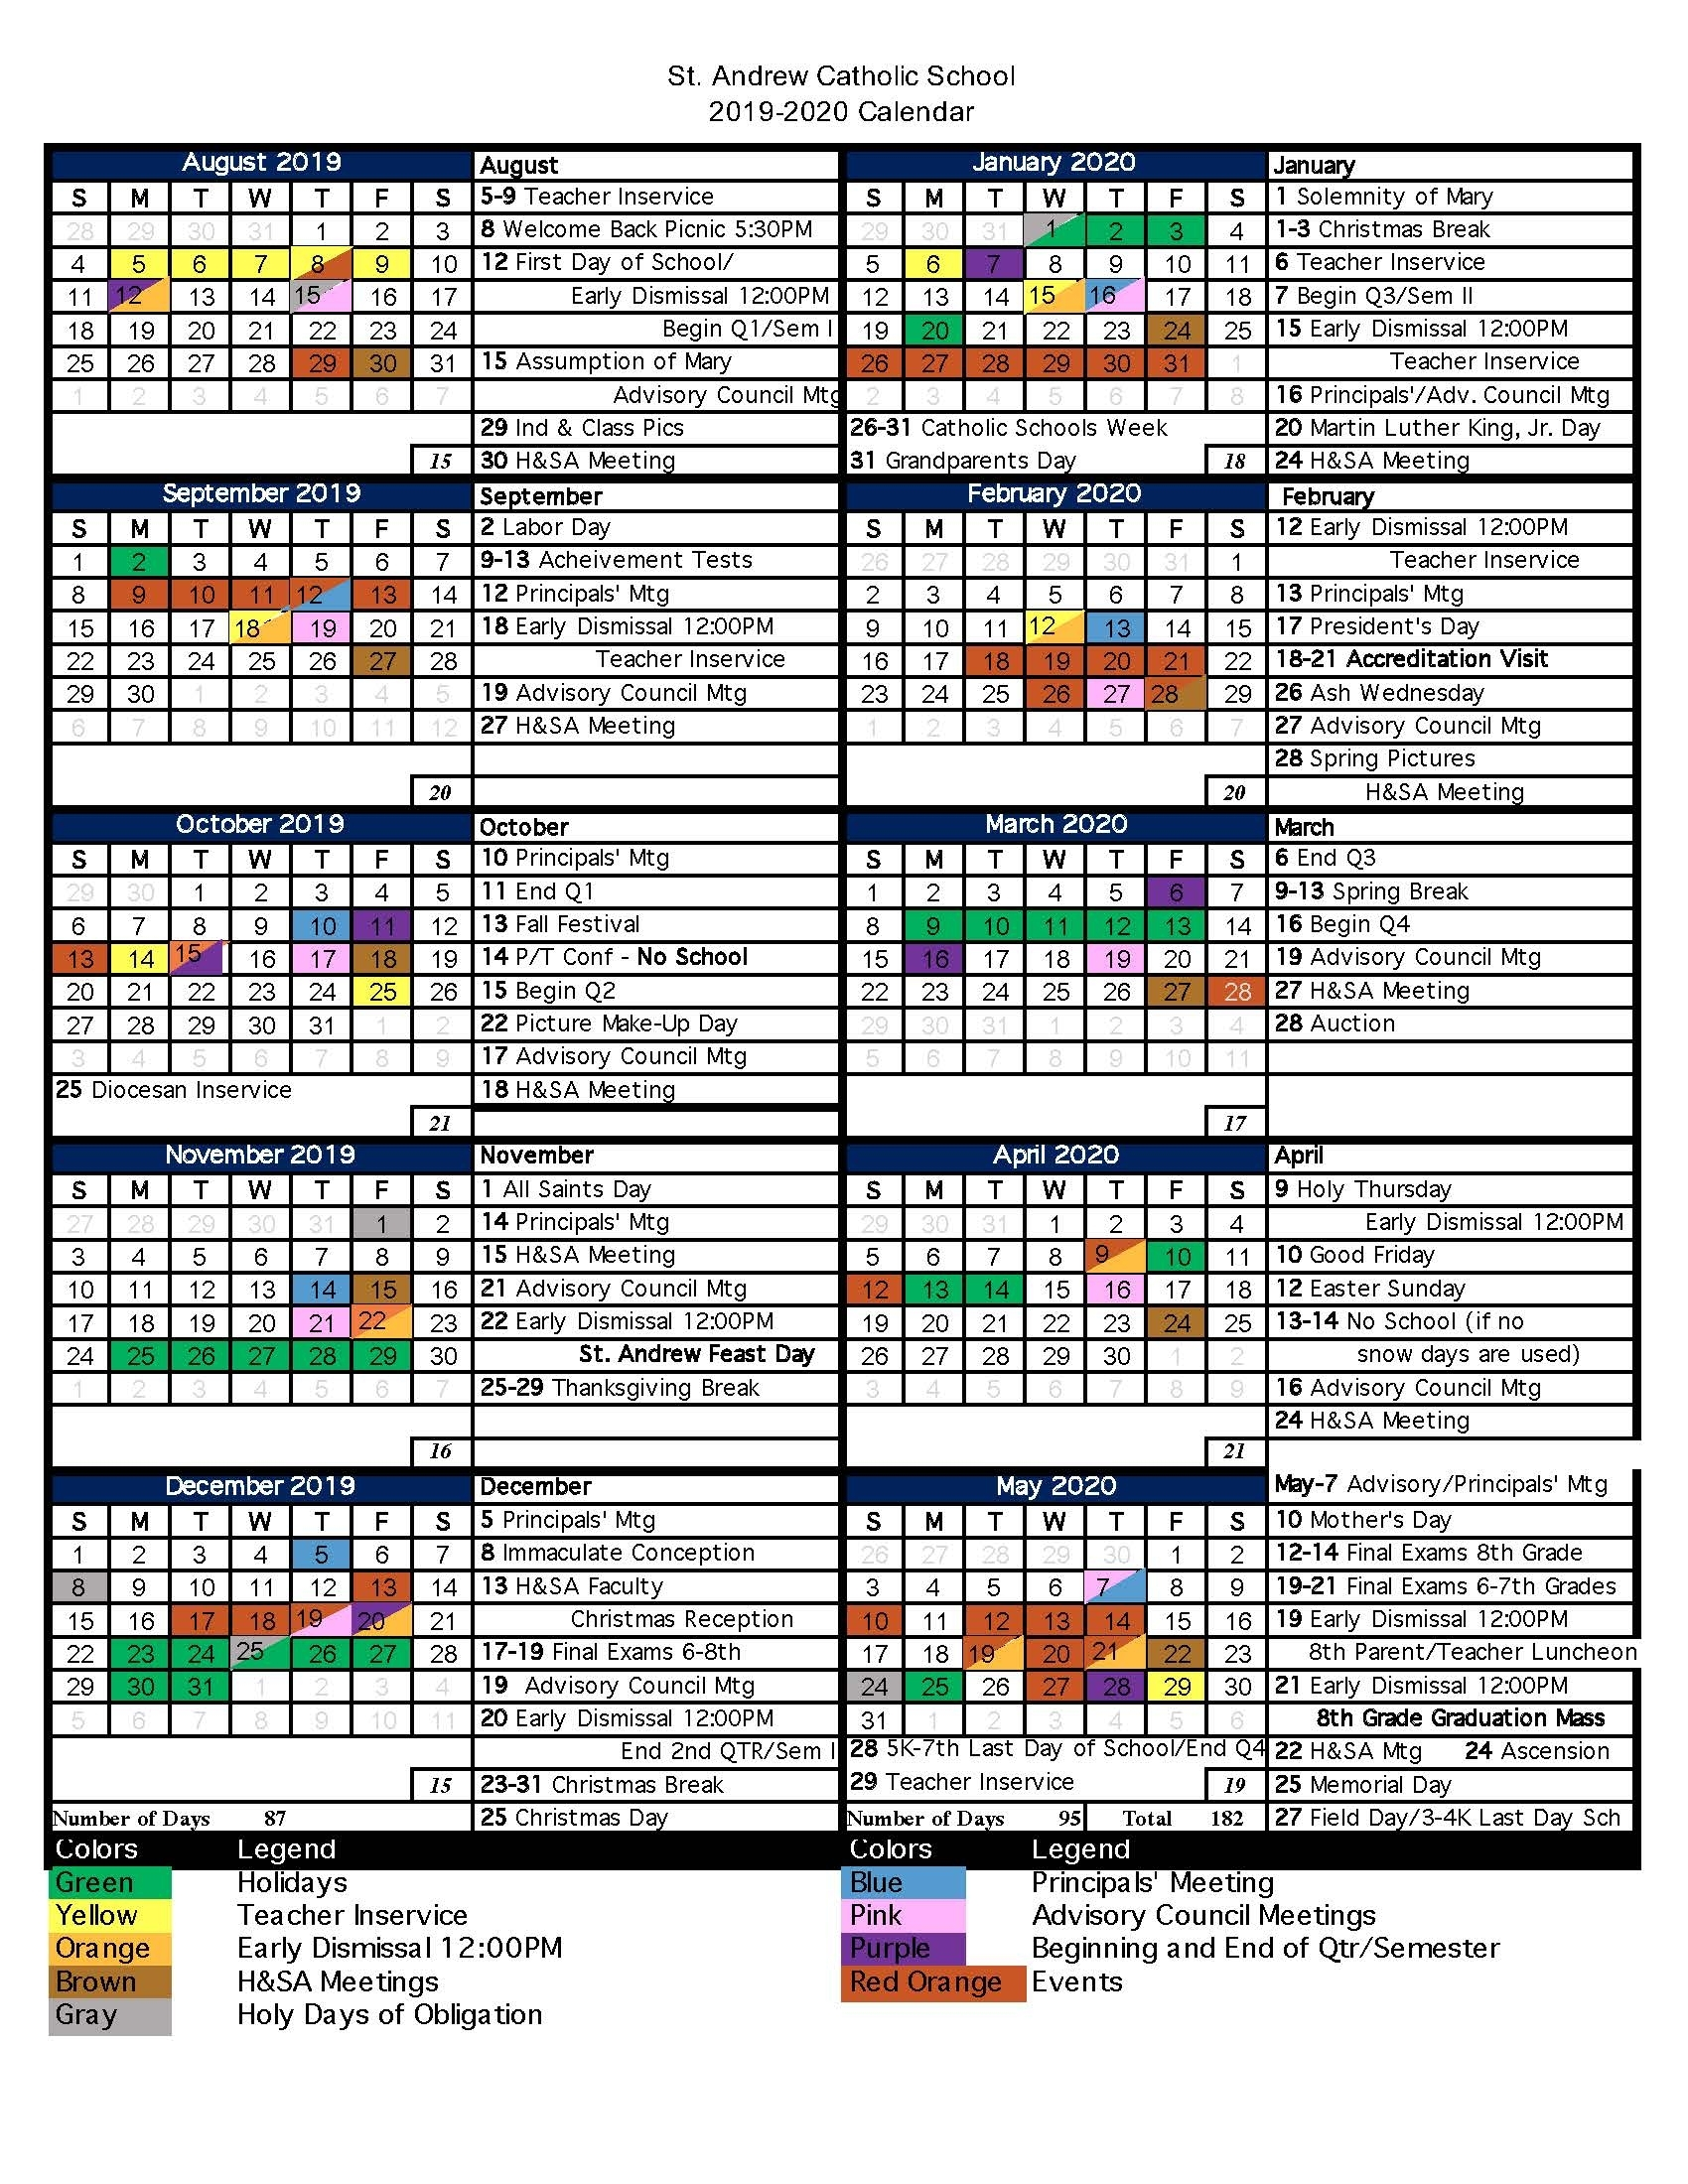 Saint Andrew Catholic School |Christ-Centered Community Working In with regard to Stephen F Austin 2019 2020 Calendar